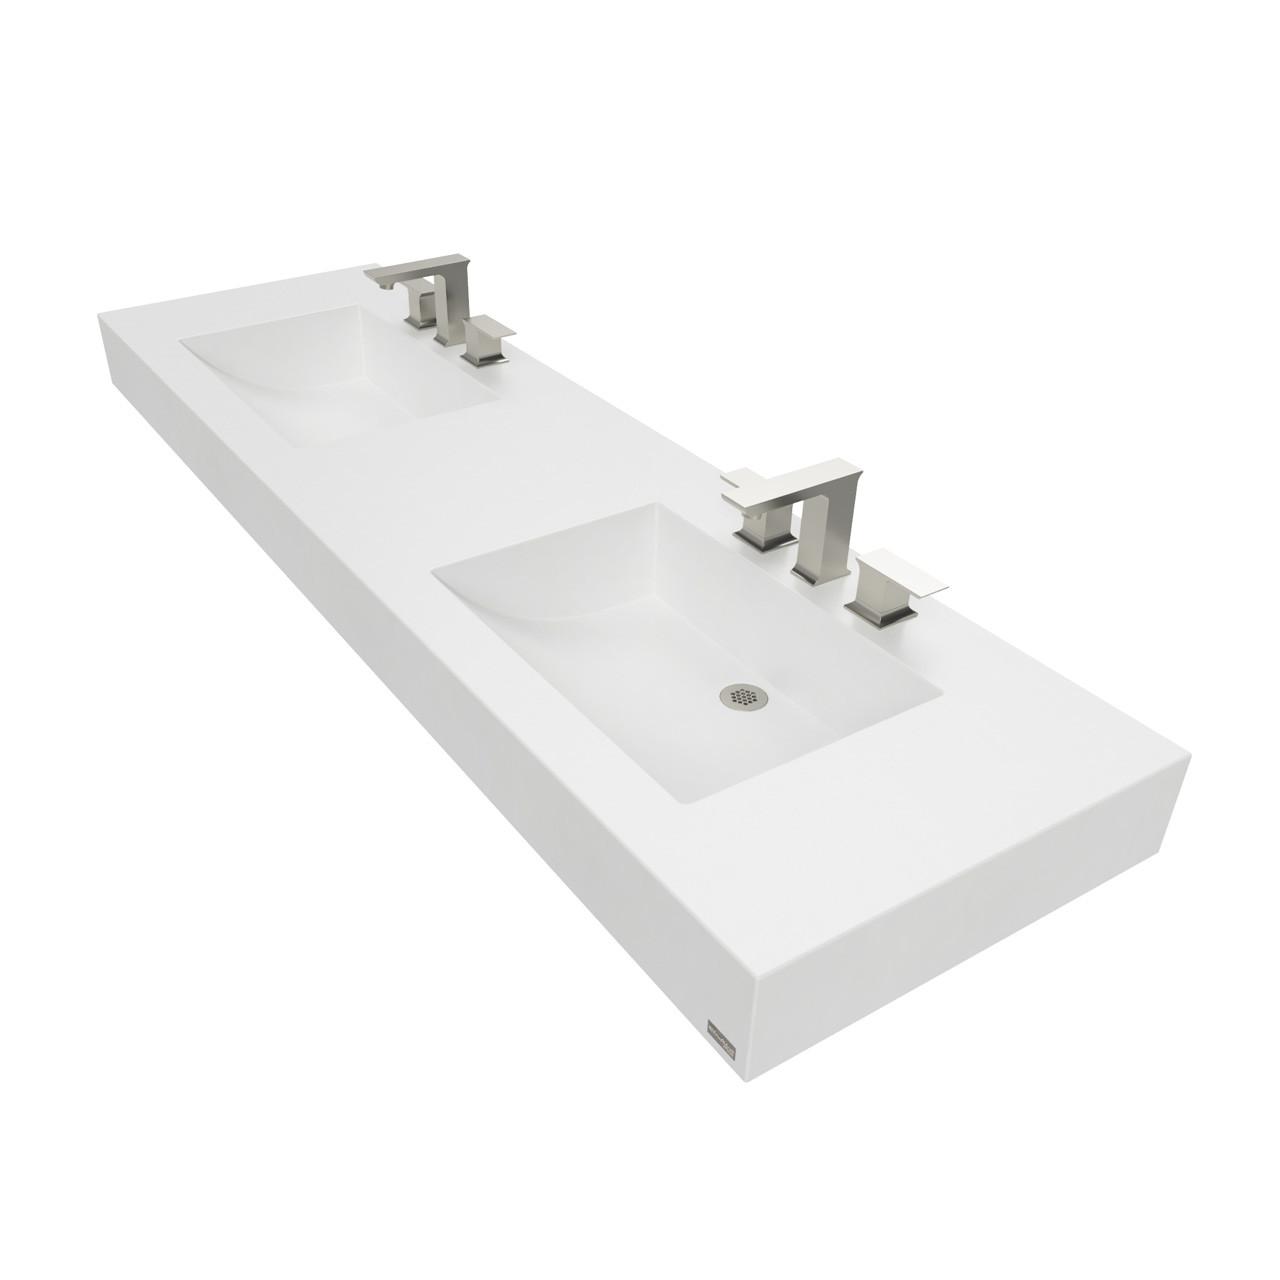 Trueform 72 Ada Floating Concrete Double Half Trough Sink